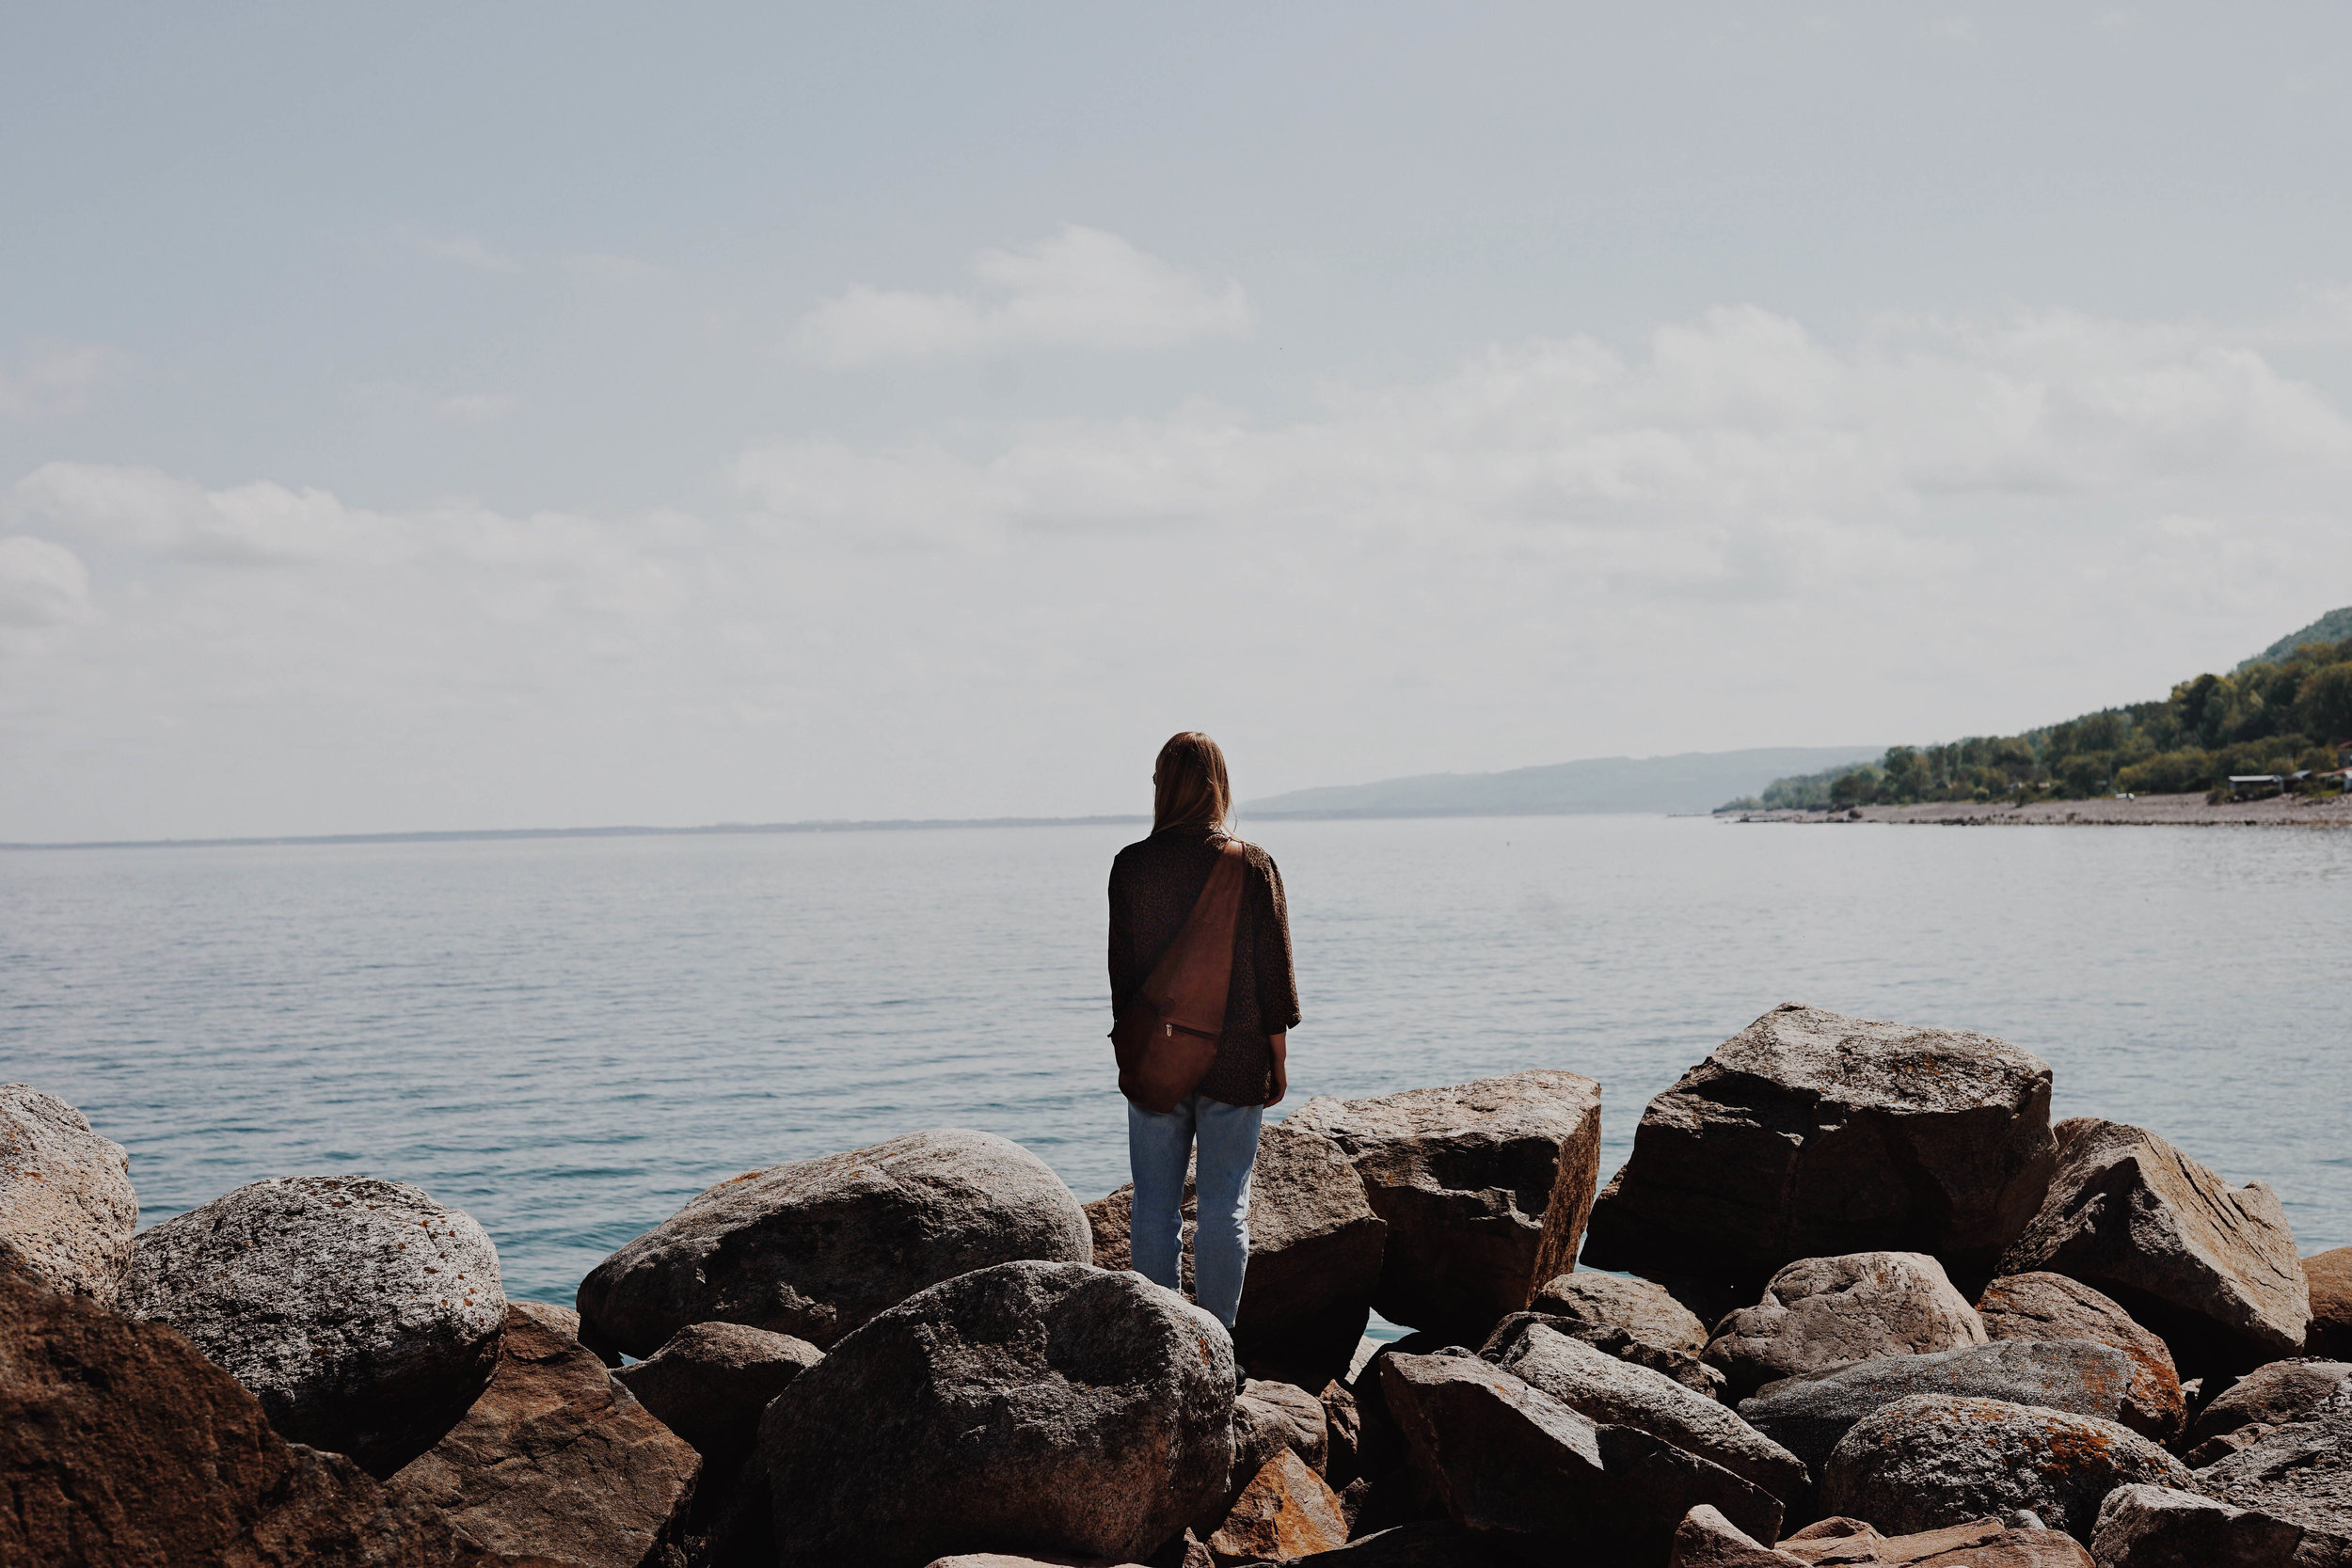 ASROSENVINGE_VisitSkane_Sweden_Kattvik_Harbour_Sea_View_LowRes-196.jpg